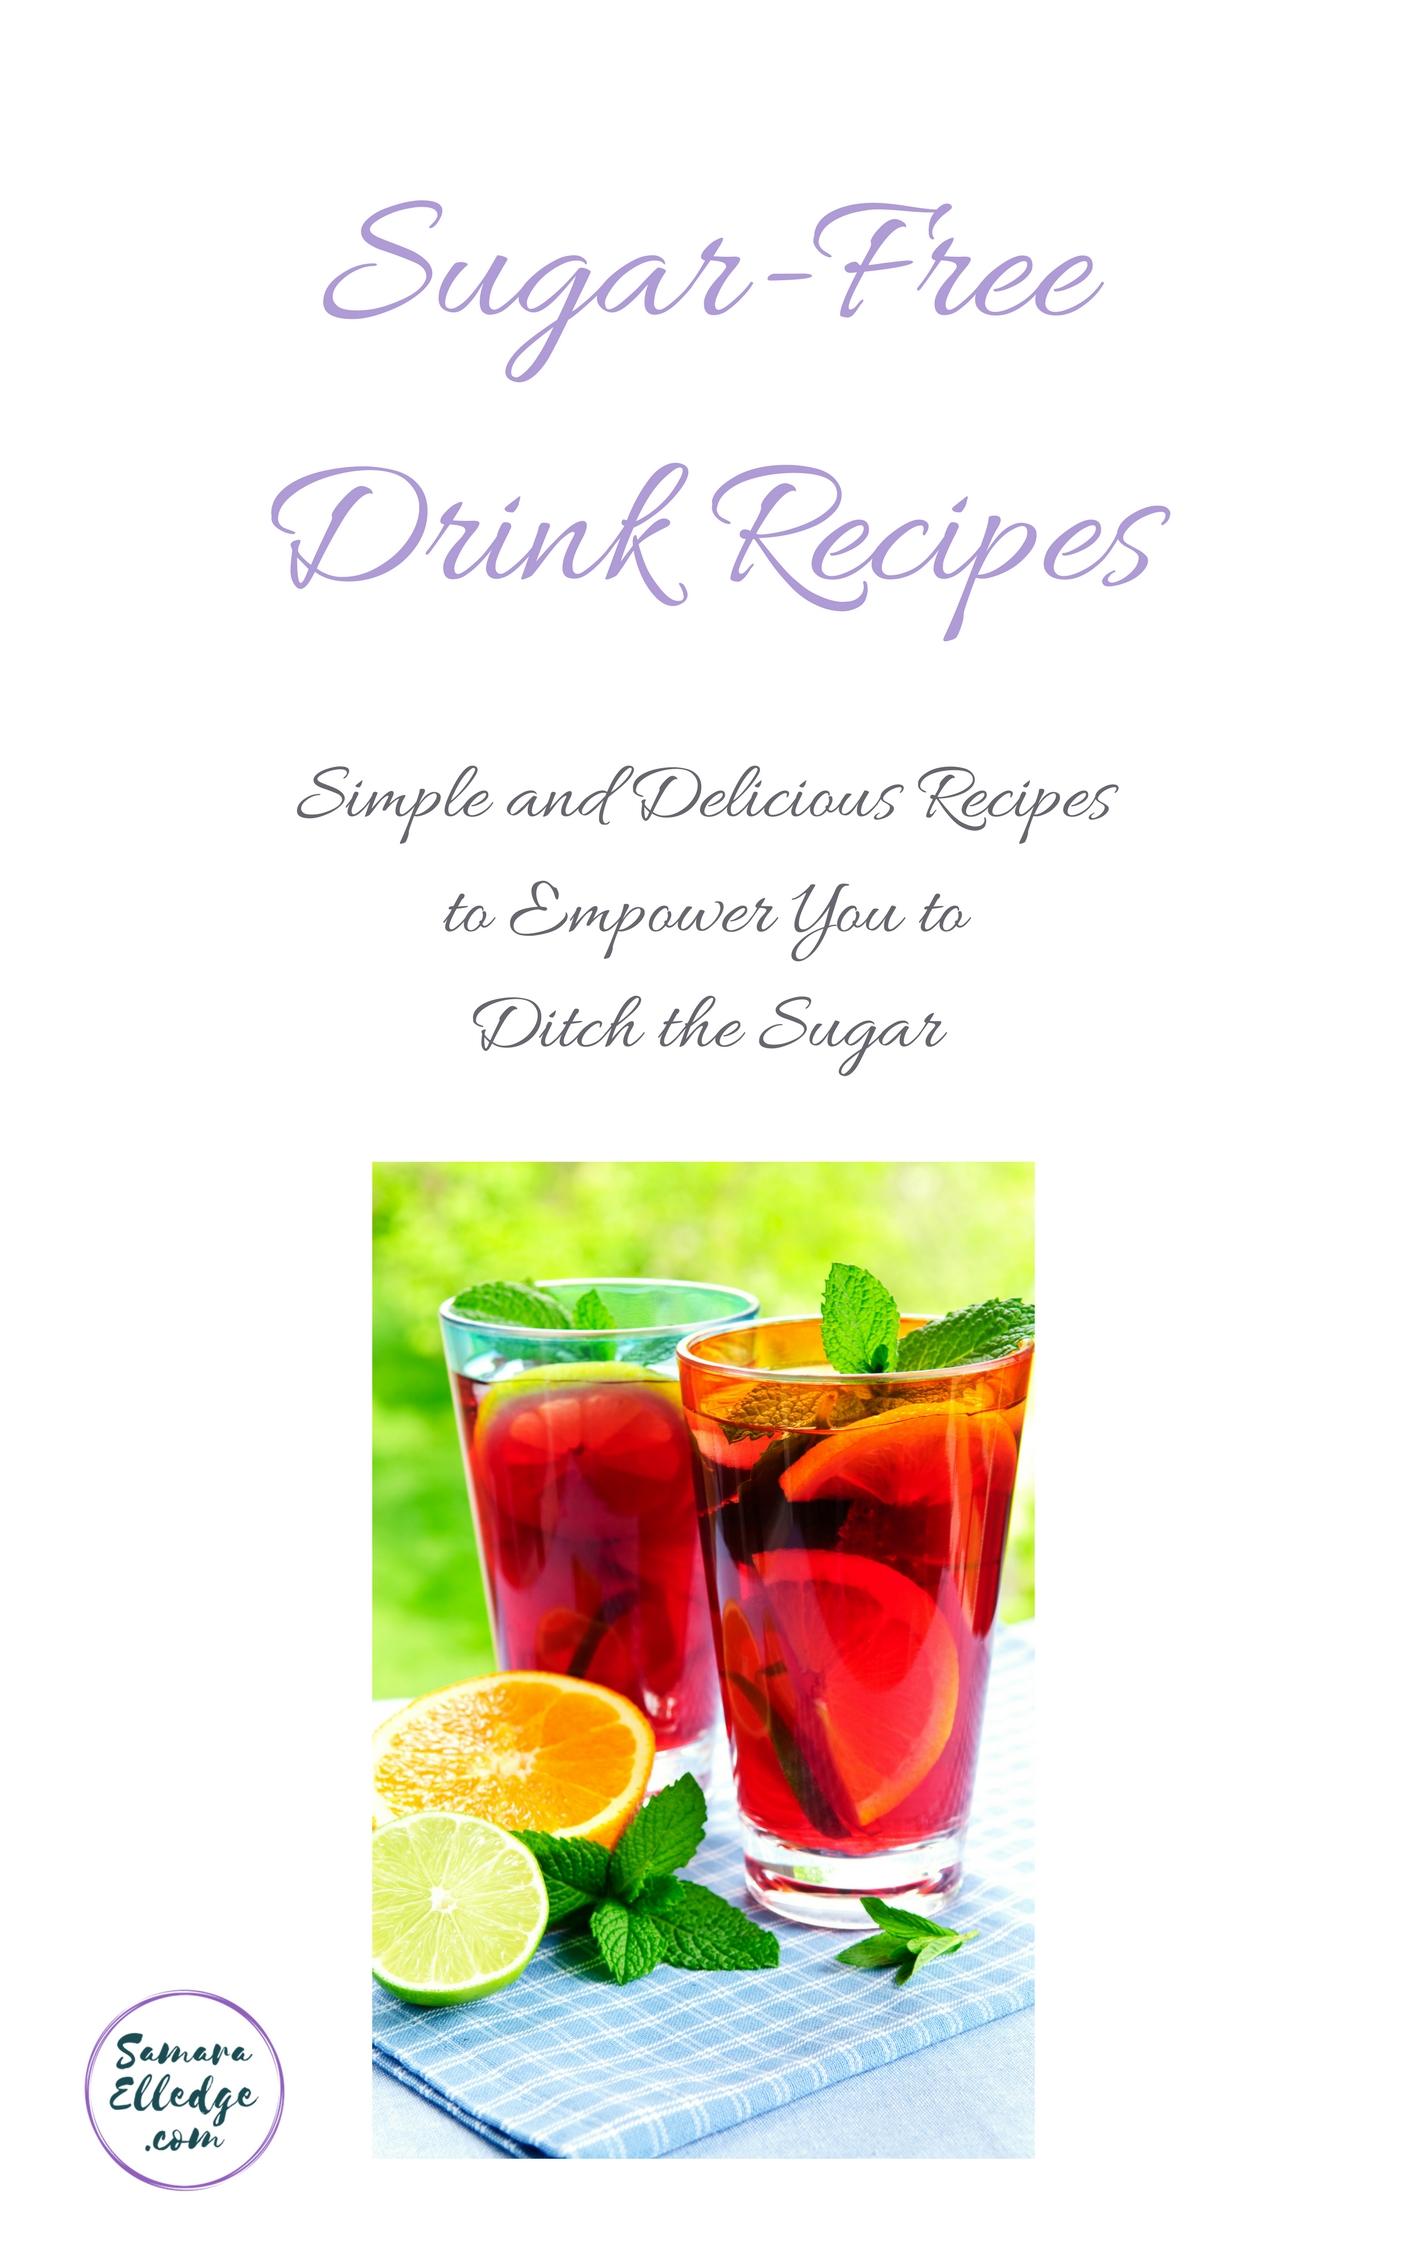 Sugar-Free Drink Recipes Cover.jpg